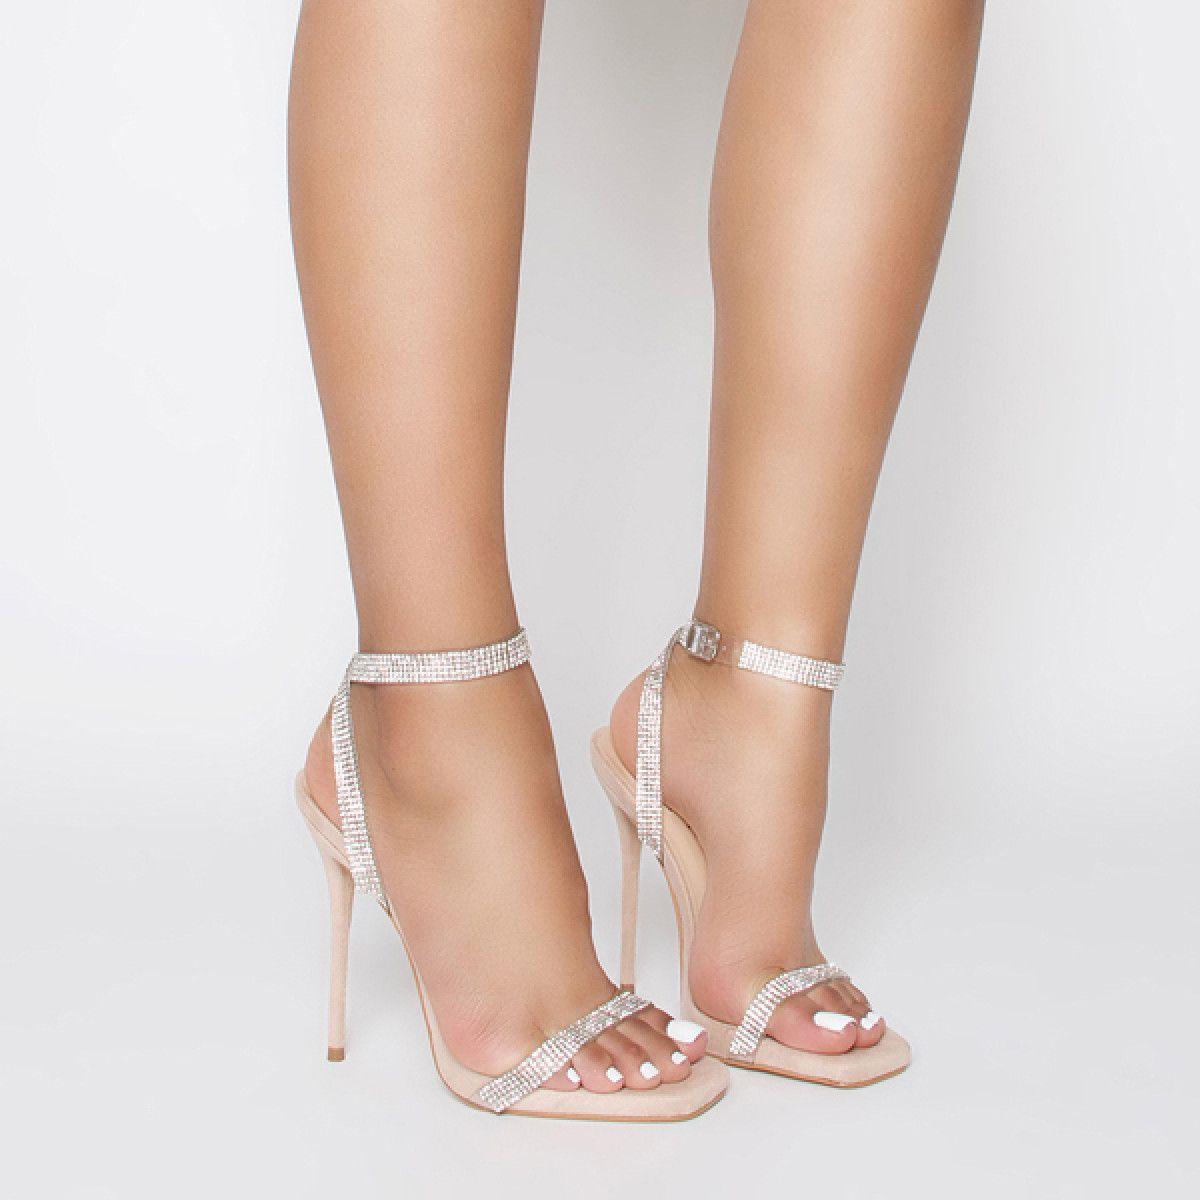 274b9ce91ec Laurel Nude Suede Clear Diamante Square Toe Heels   Simmi Shoes